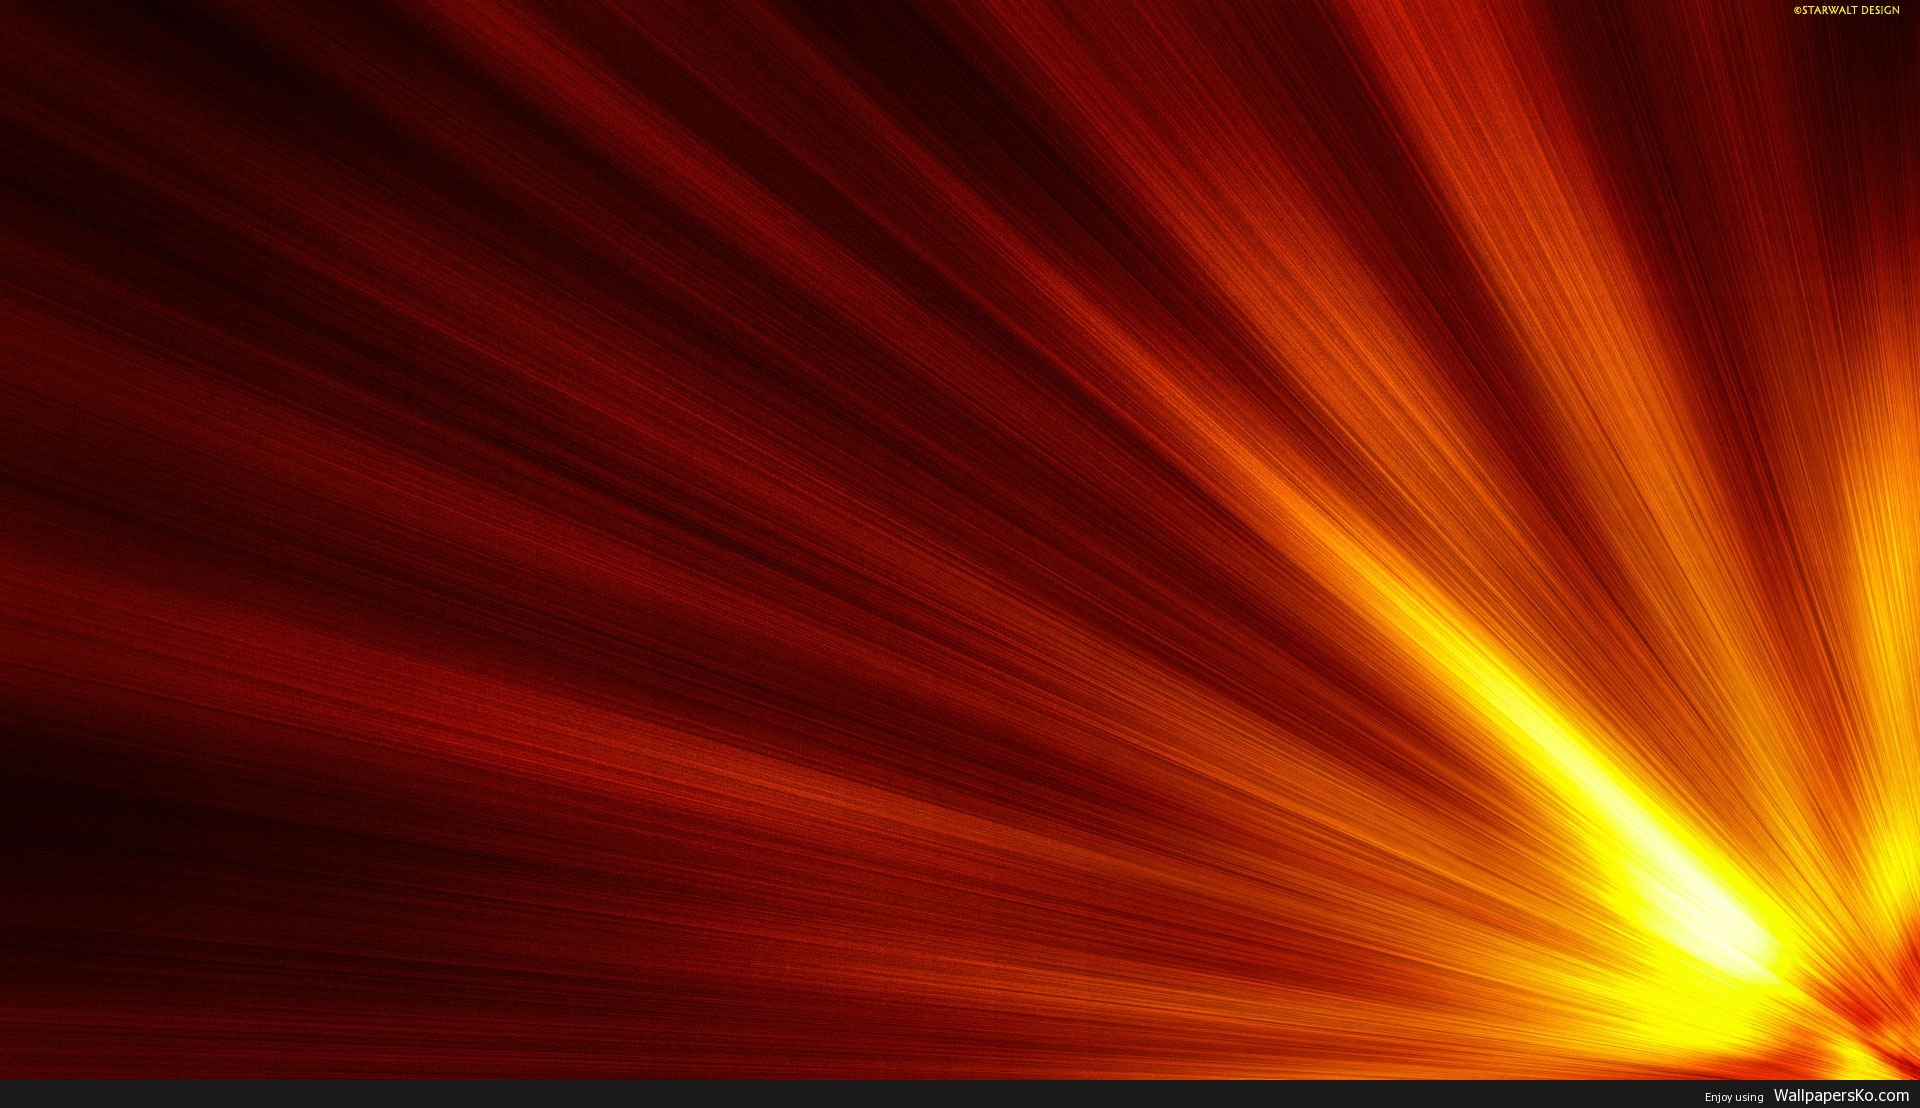 sun-abstract-wallpaper-abstract-wallpapers-hd-sun